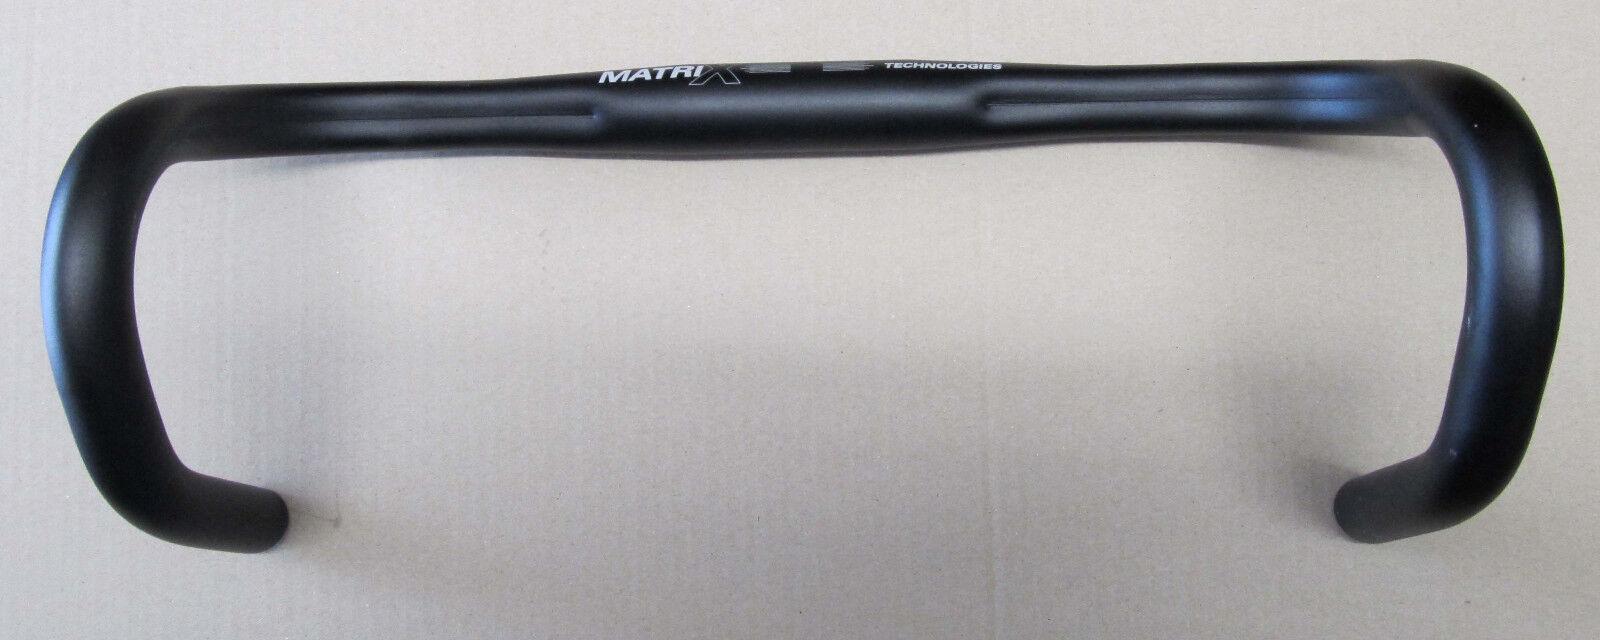 Matrix Kalloy AL049L Alu Rennrad Lenker 44cm black 31,8mm 440gramm NEU